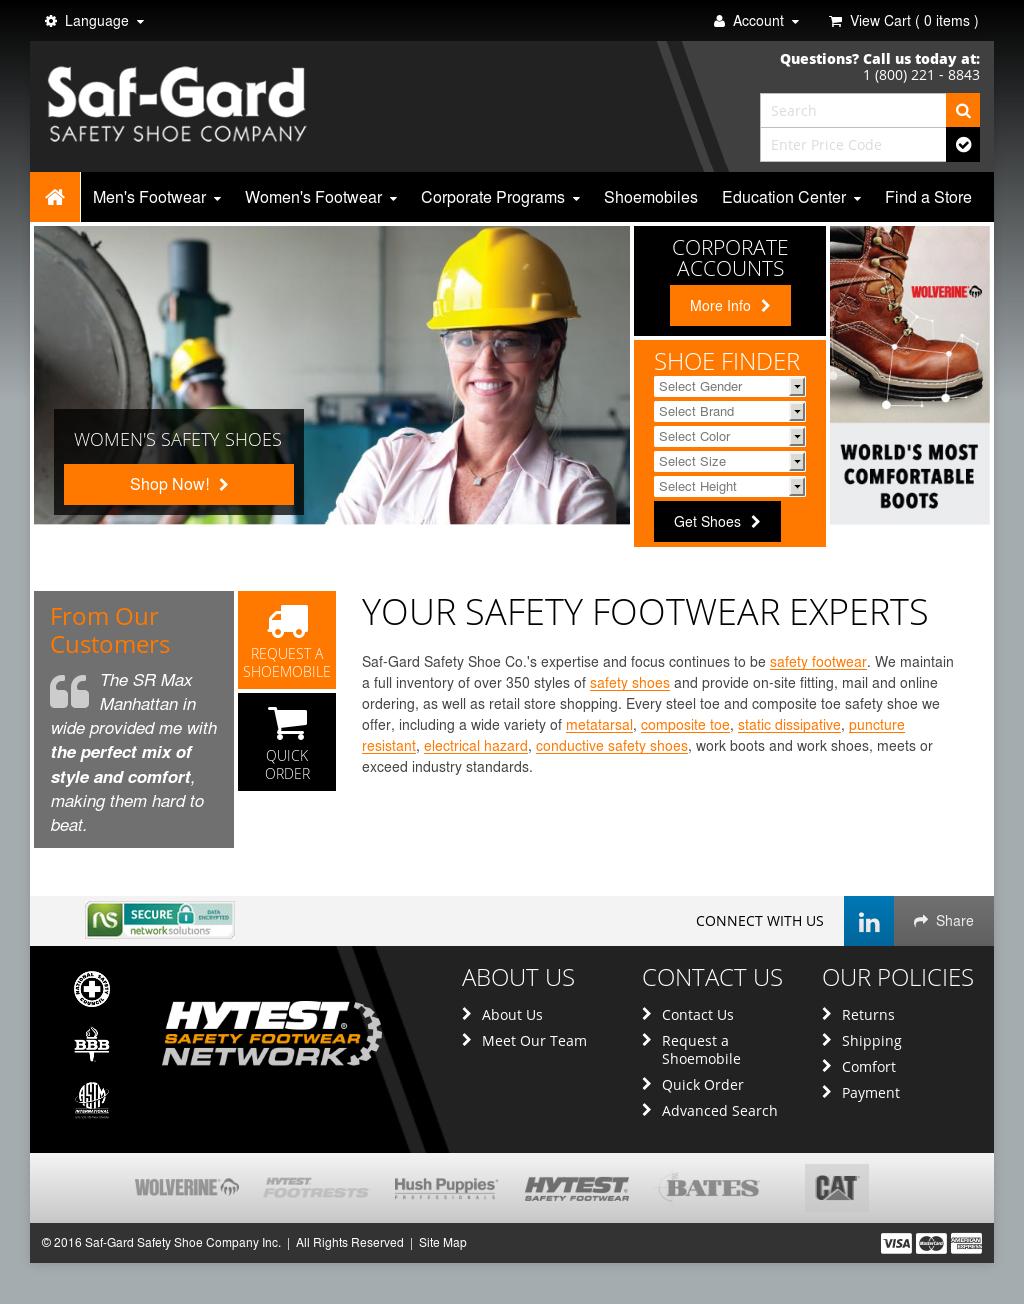 4f0659469f9 Saf-Gard Competitors, Revenue and Employees - Owler Company Profile